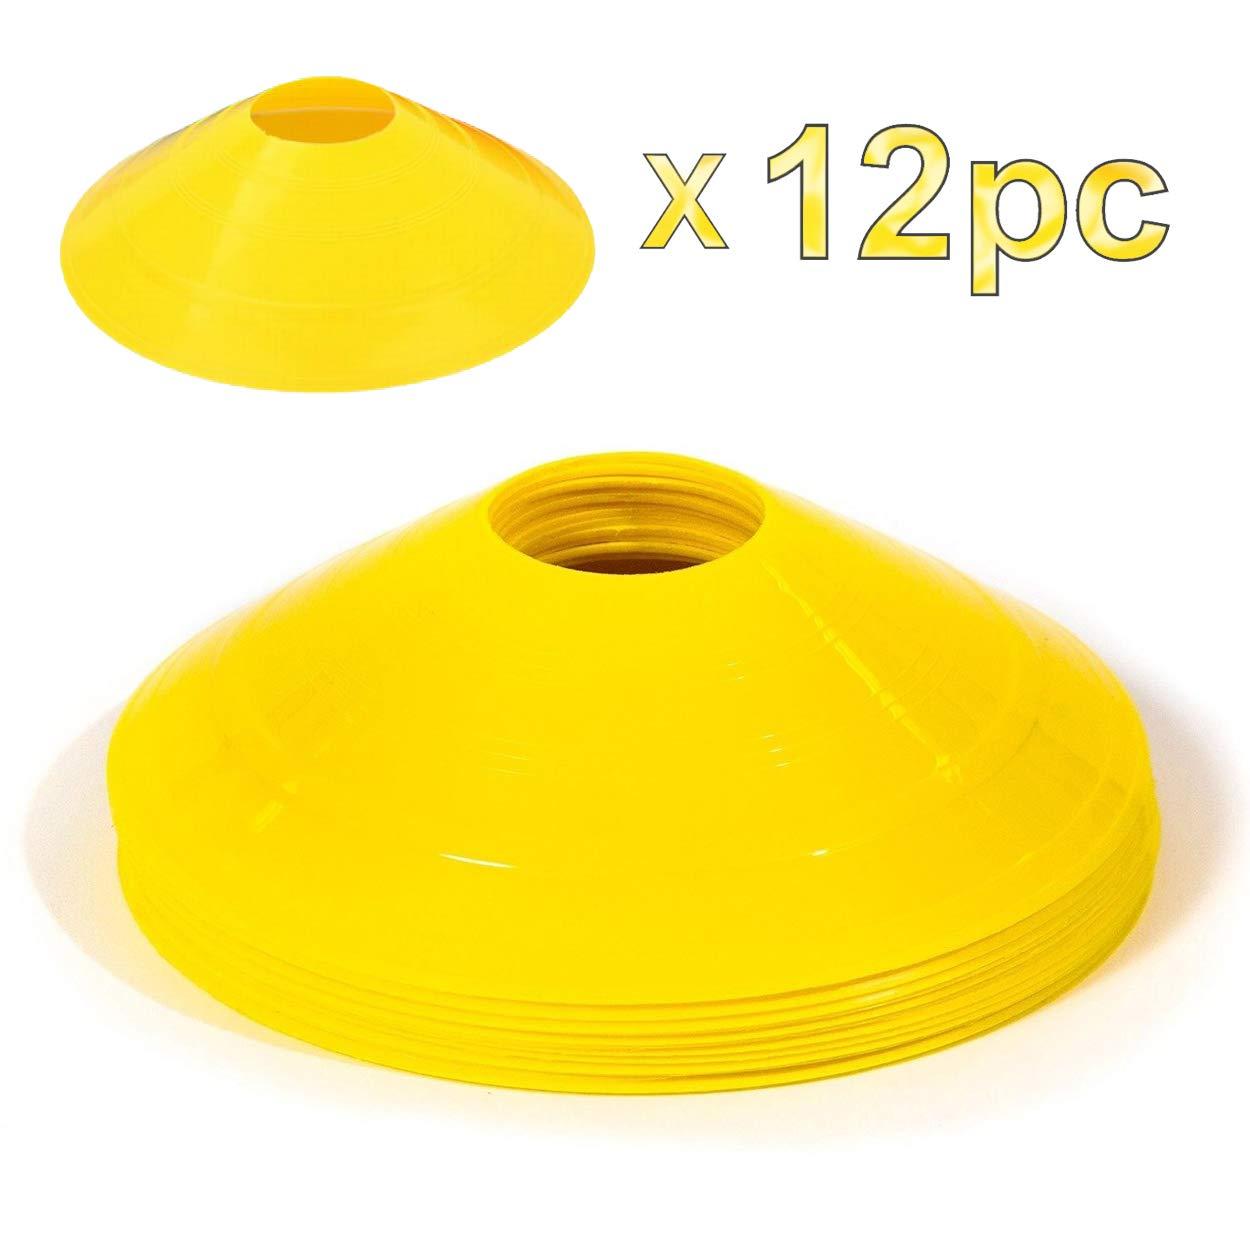 Soccer Cones Mini Agility Cones Yellow Disc, Field Cone Markers